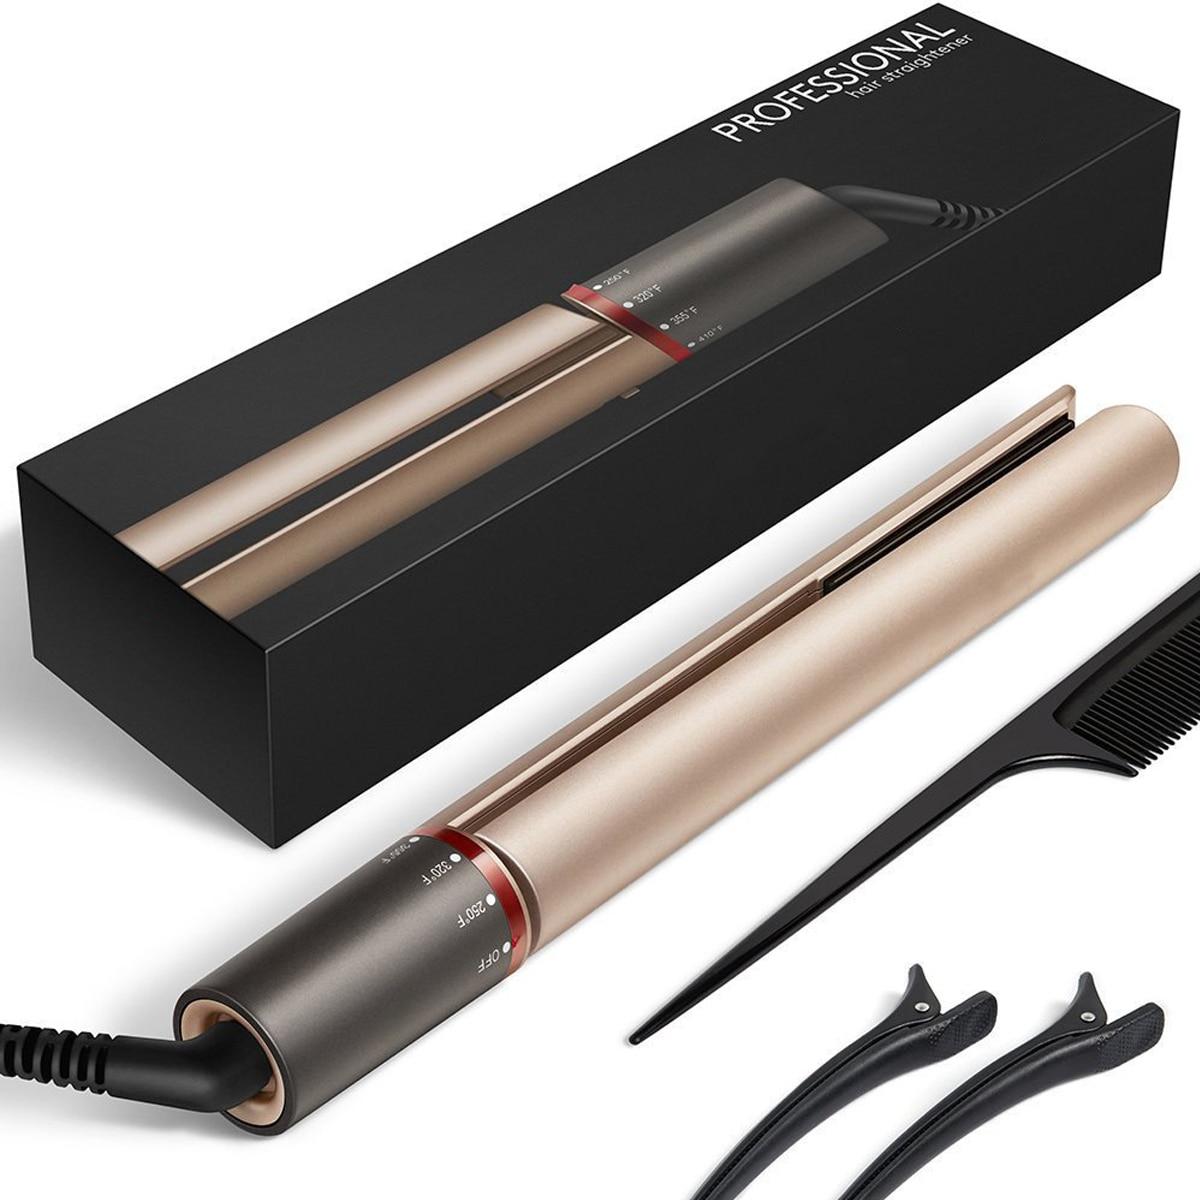 2 IN 1 Professional Hair Curler Straightener Rotating Anti Winding Fast Heating Tourmaline Ceramic Iron Hair Styling Tool Set